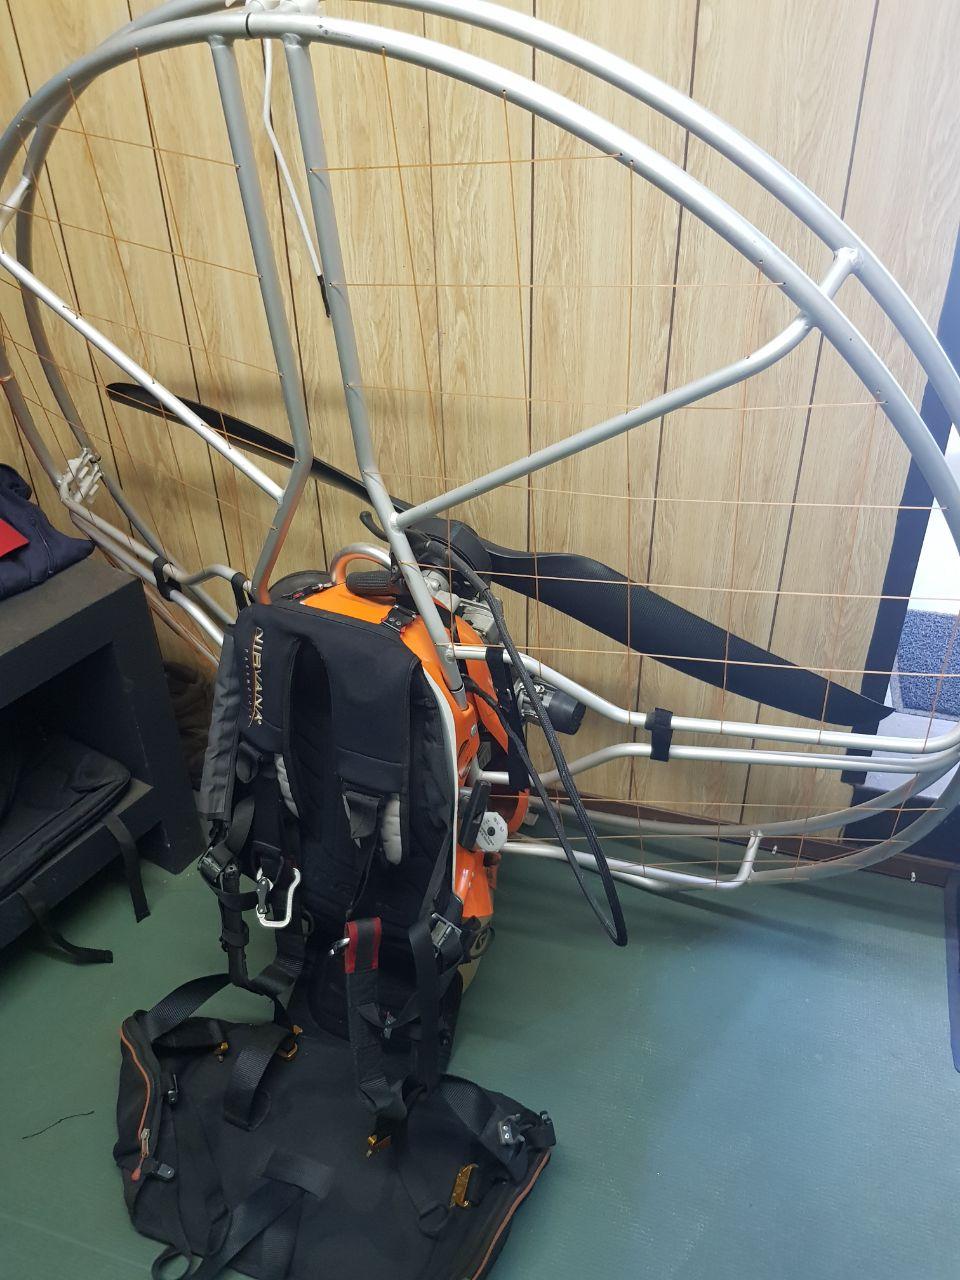 Paramotor, Paragliding Motor Nirvana Rodeo